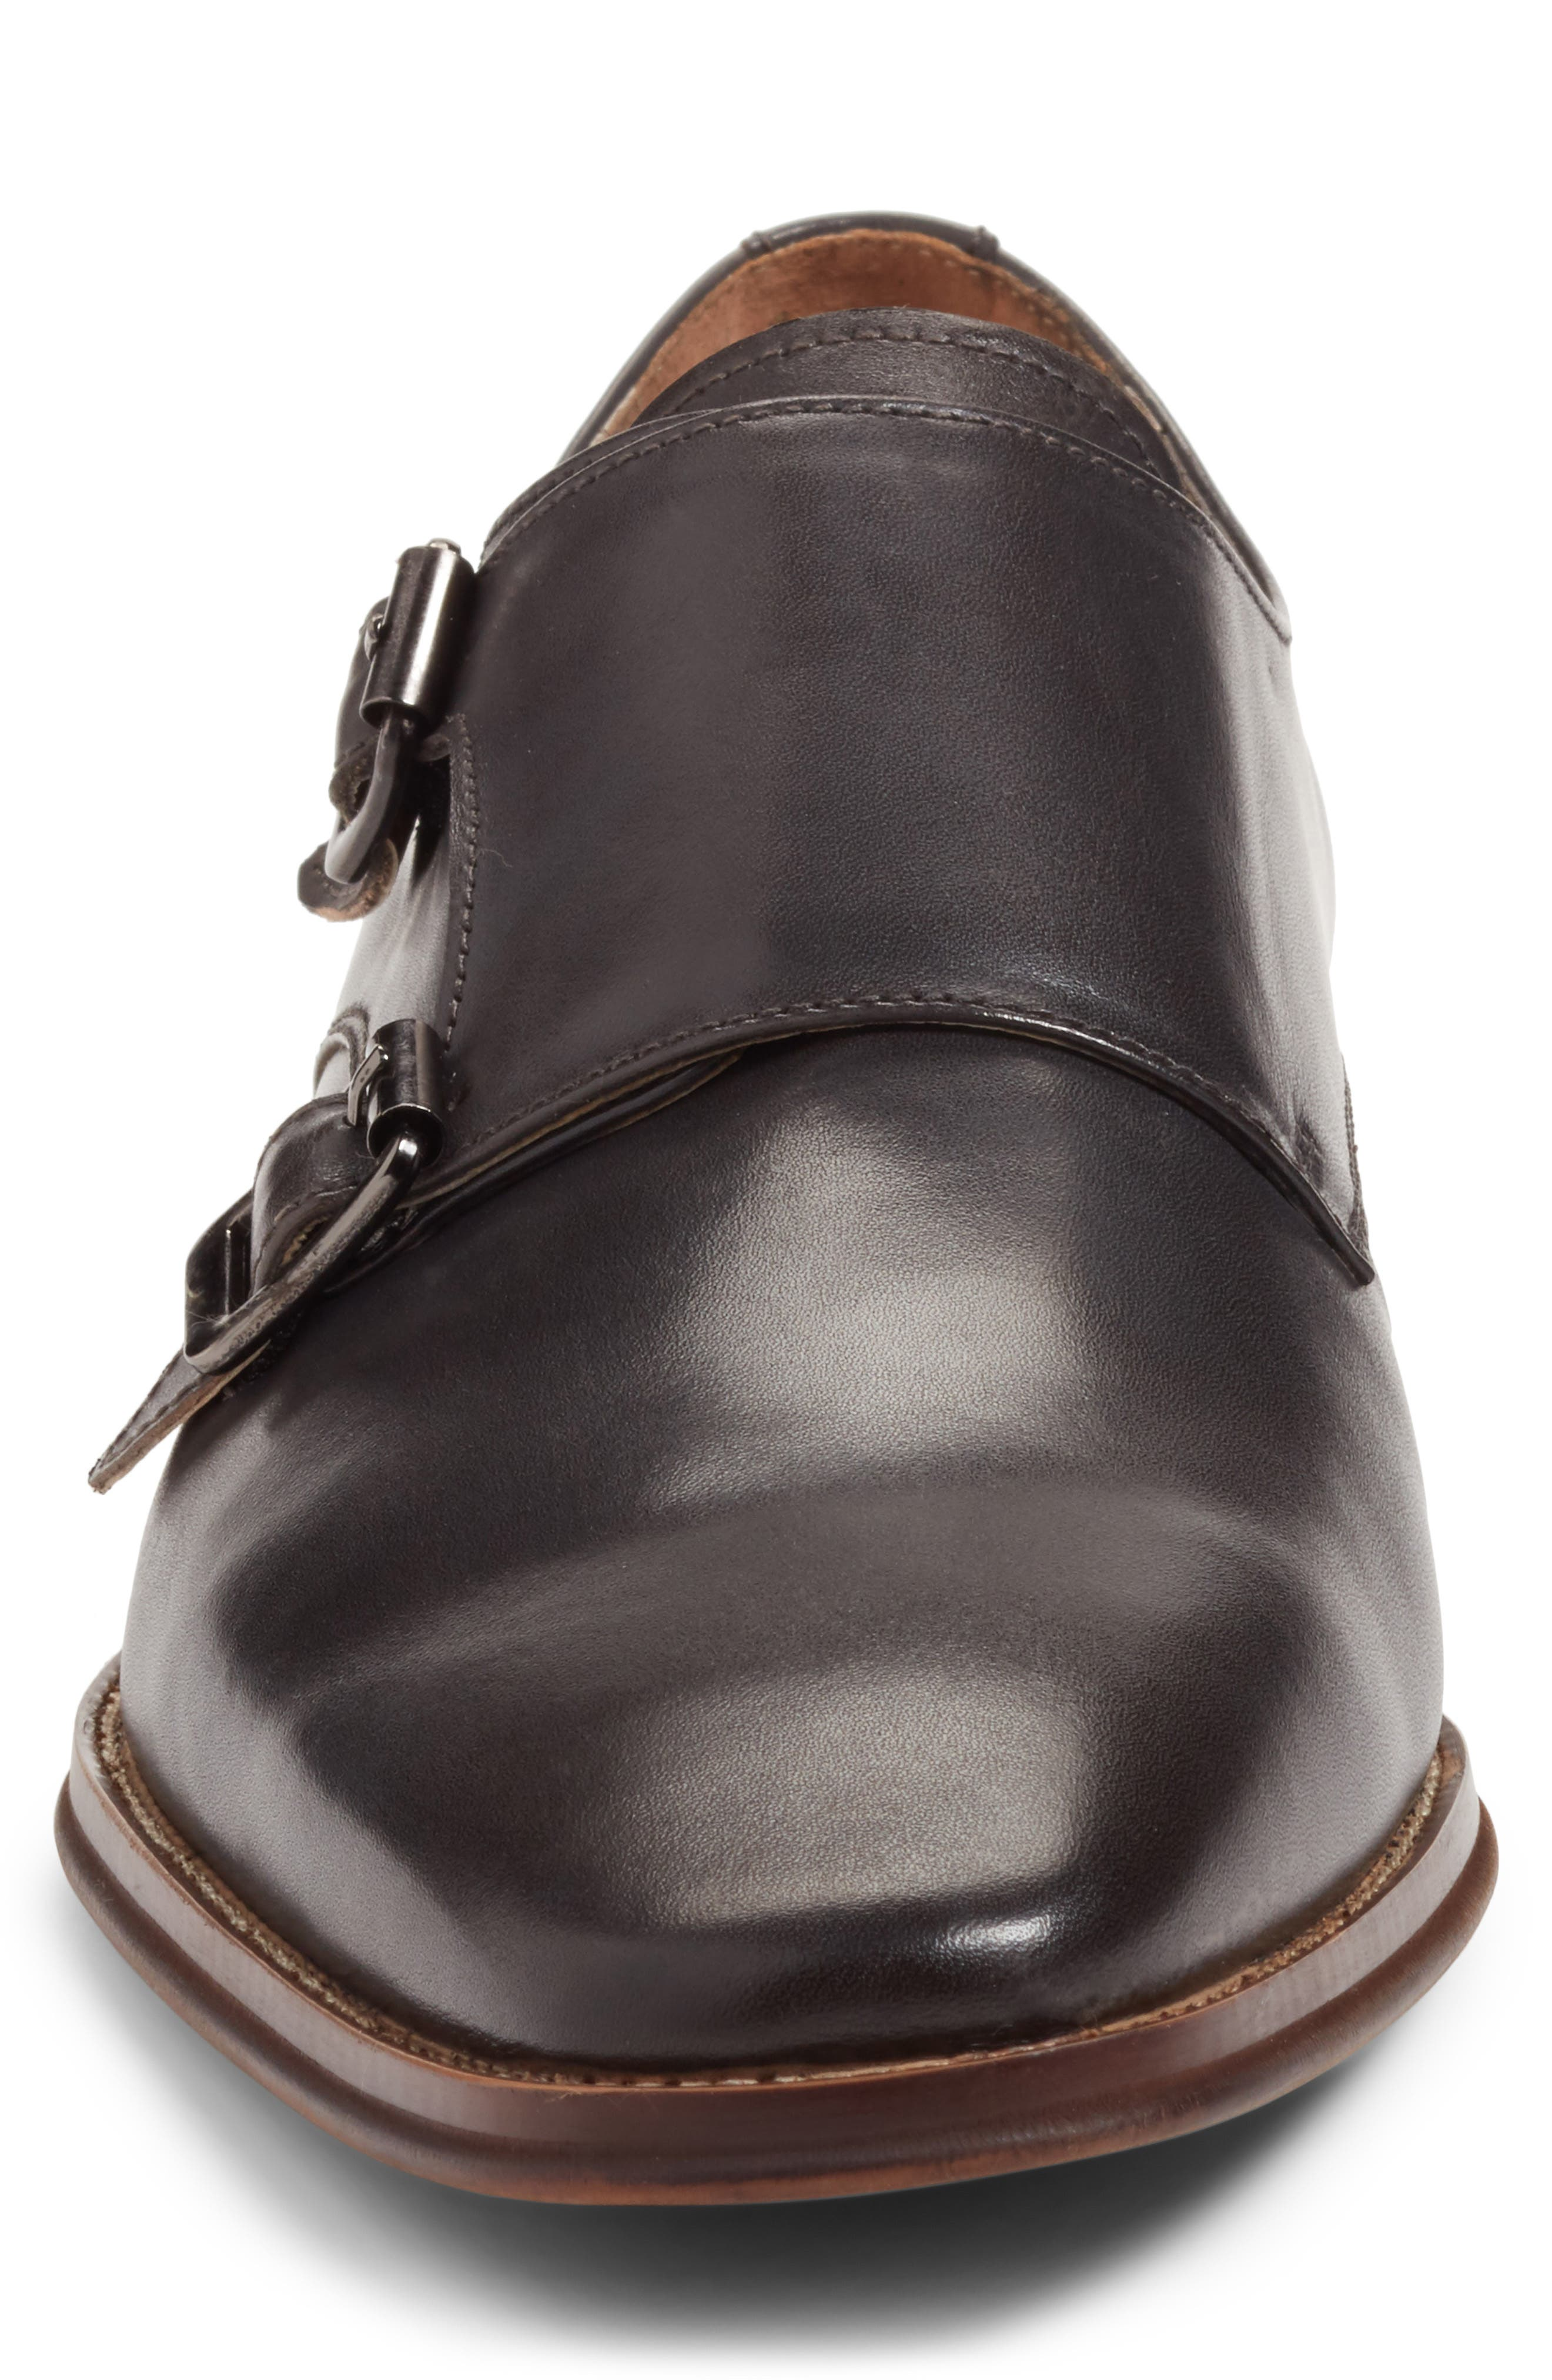 Sedona Double Strap Monk Shoe,                             Alternate thumbnail 4, color,                             Grey Leather